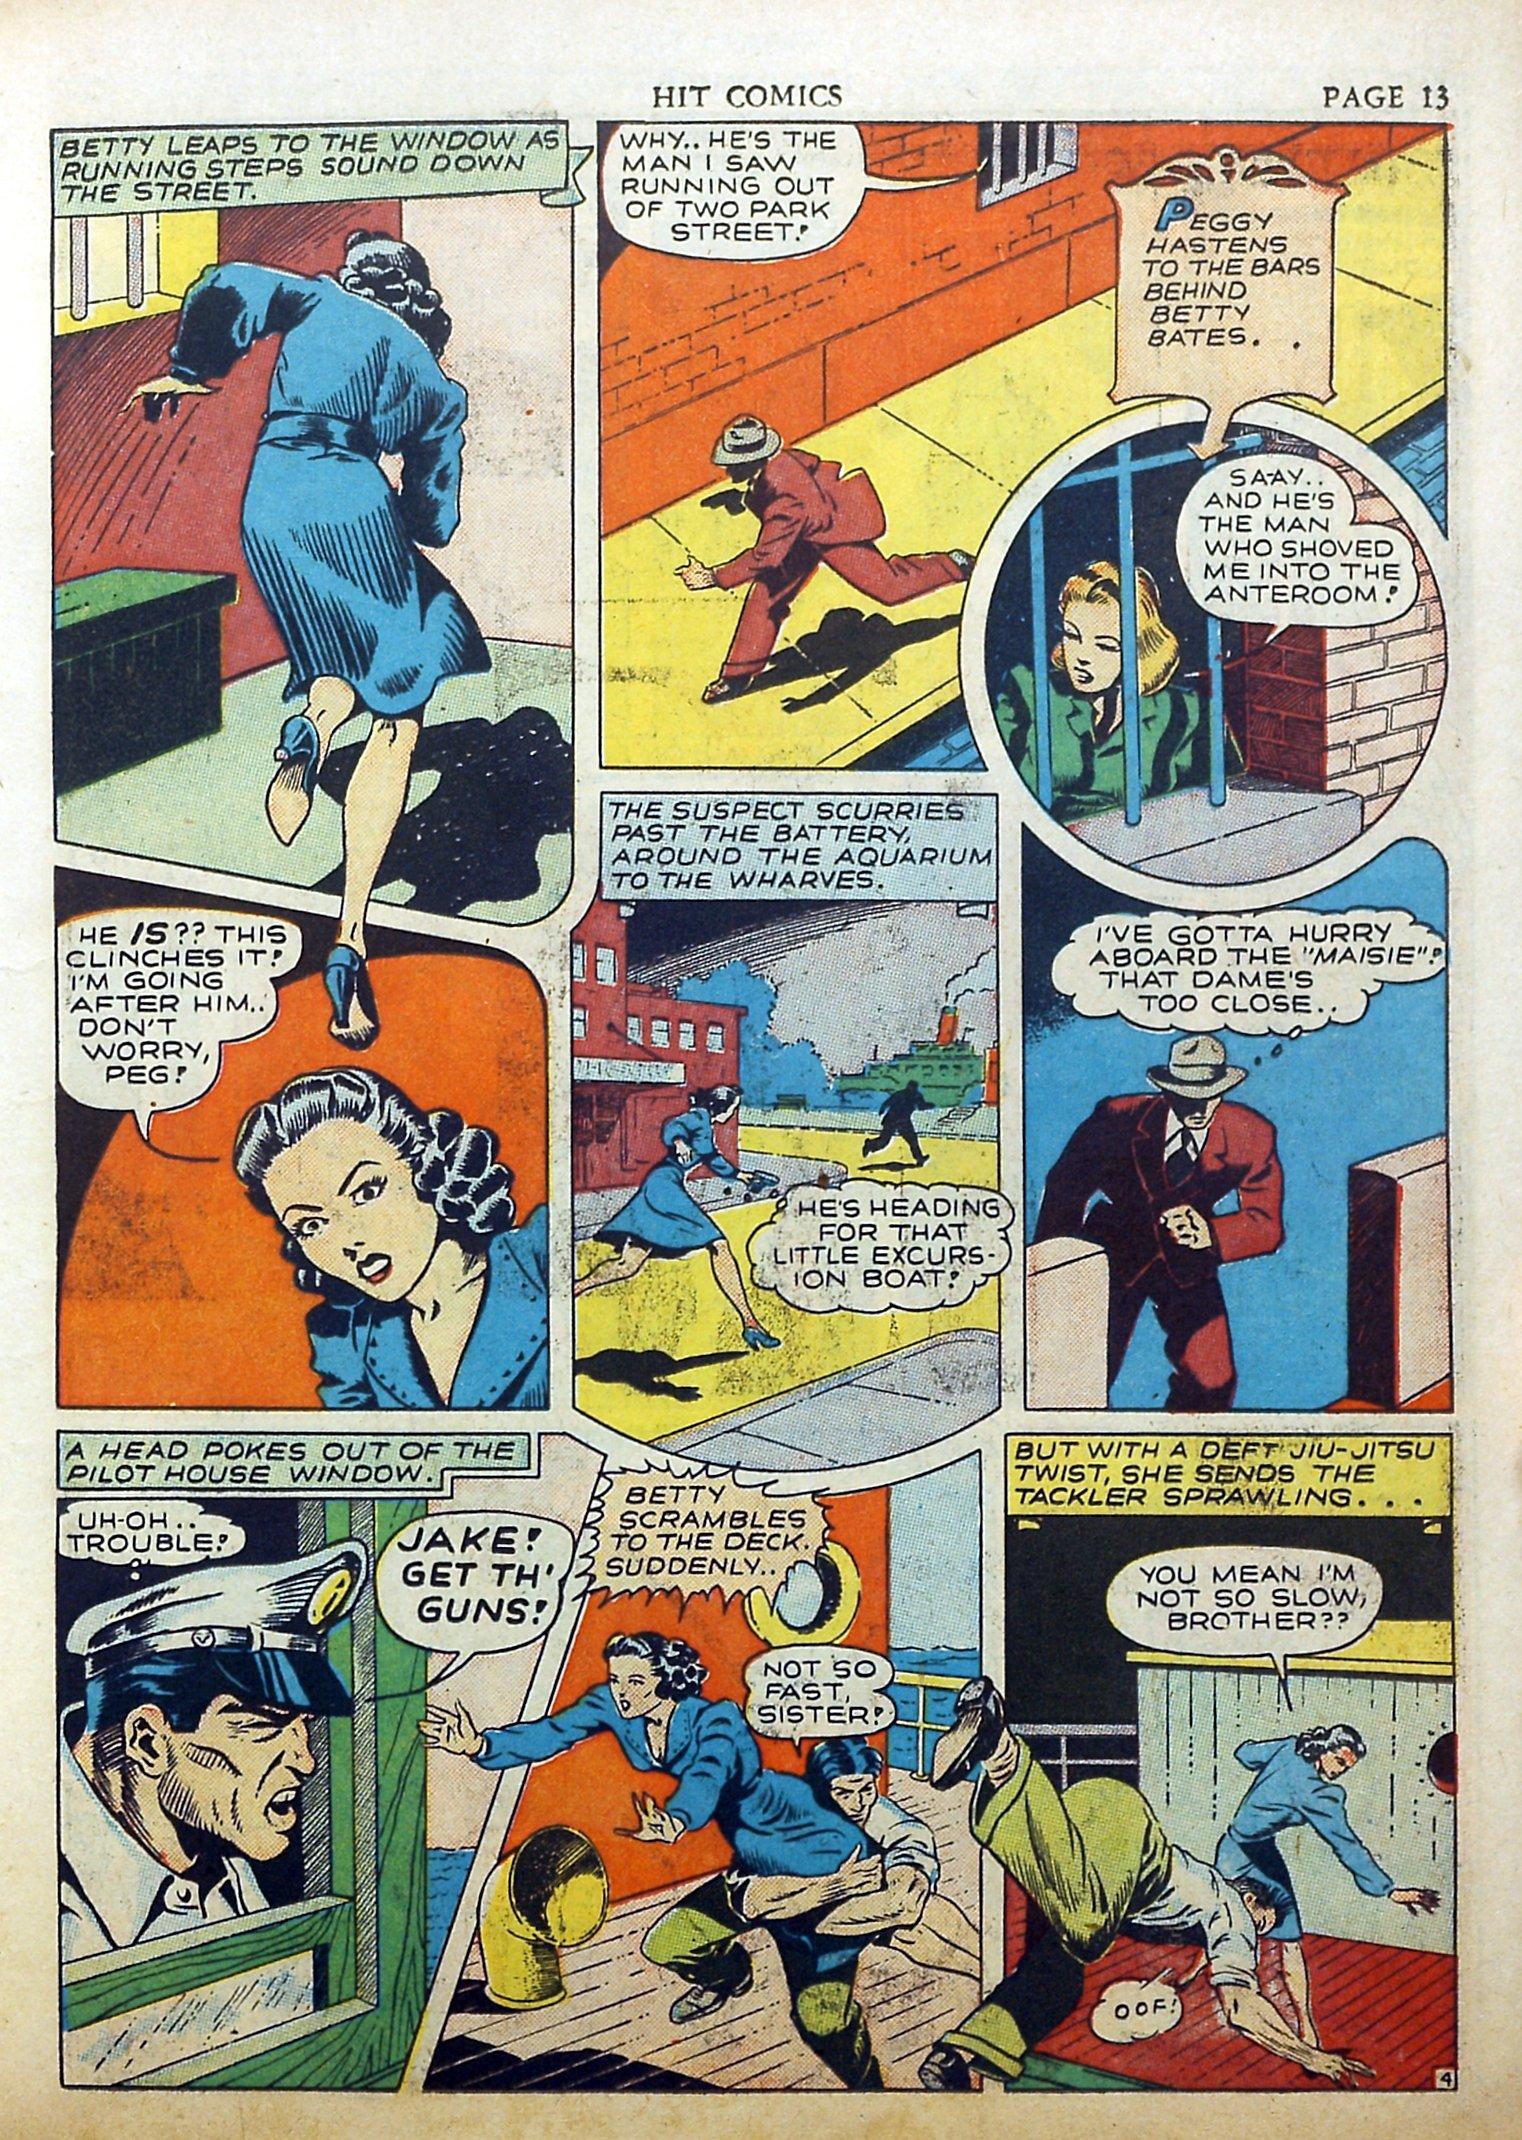 Read online Hit Comics comic -  Issue #17 - 15